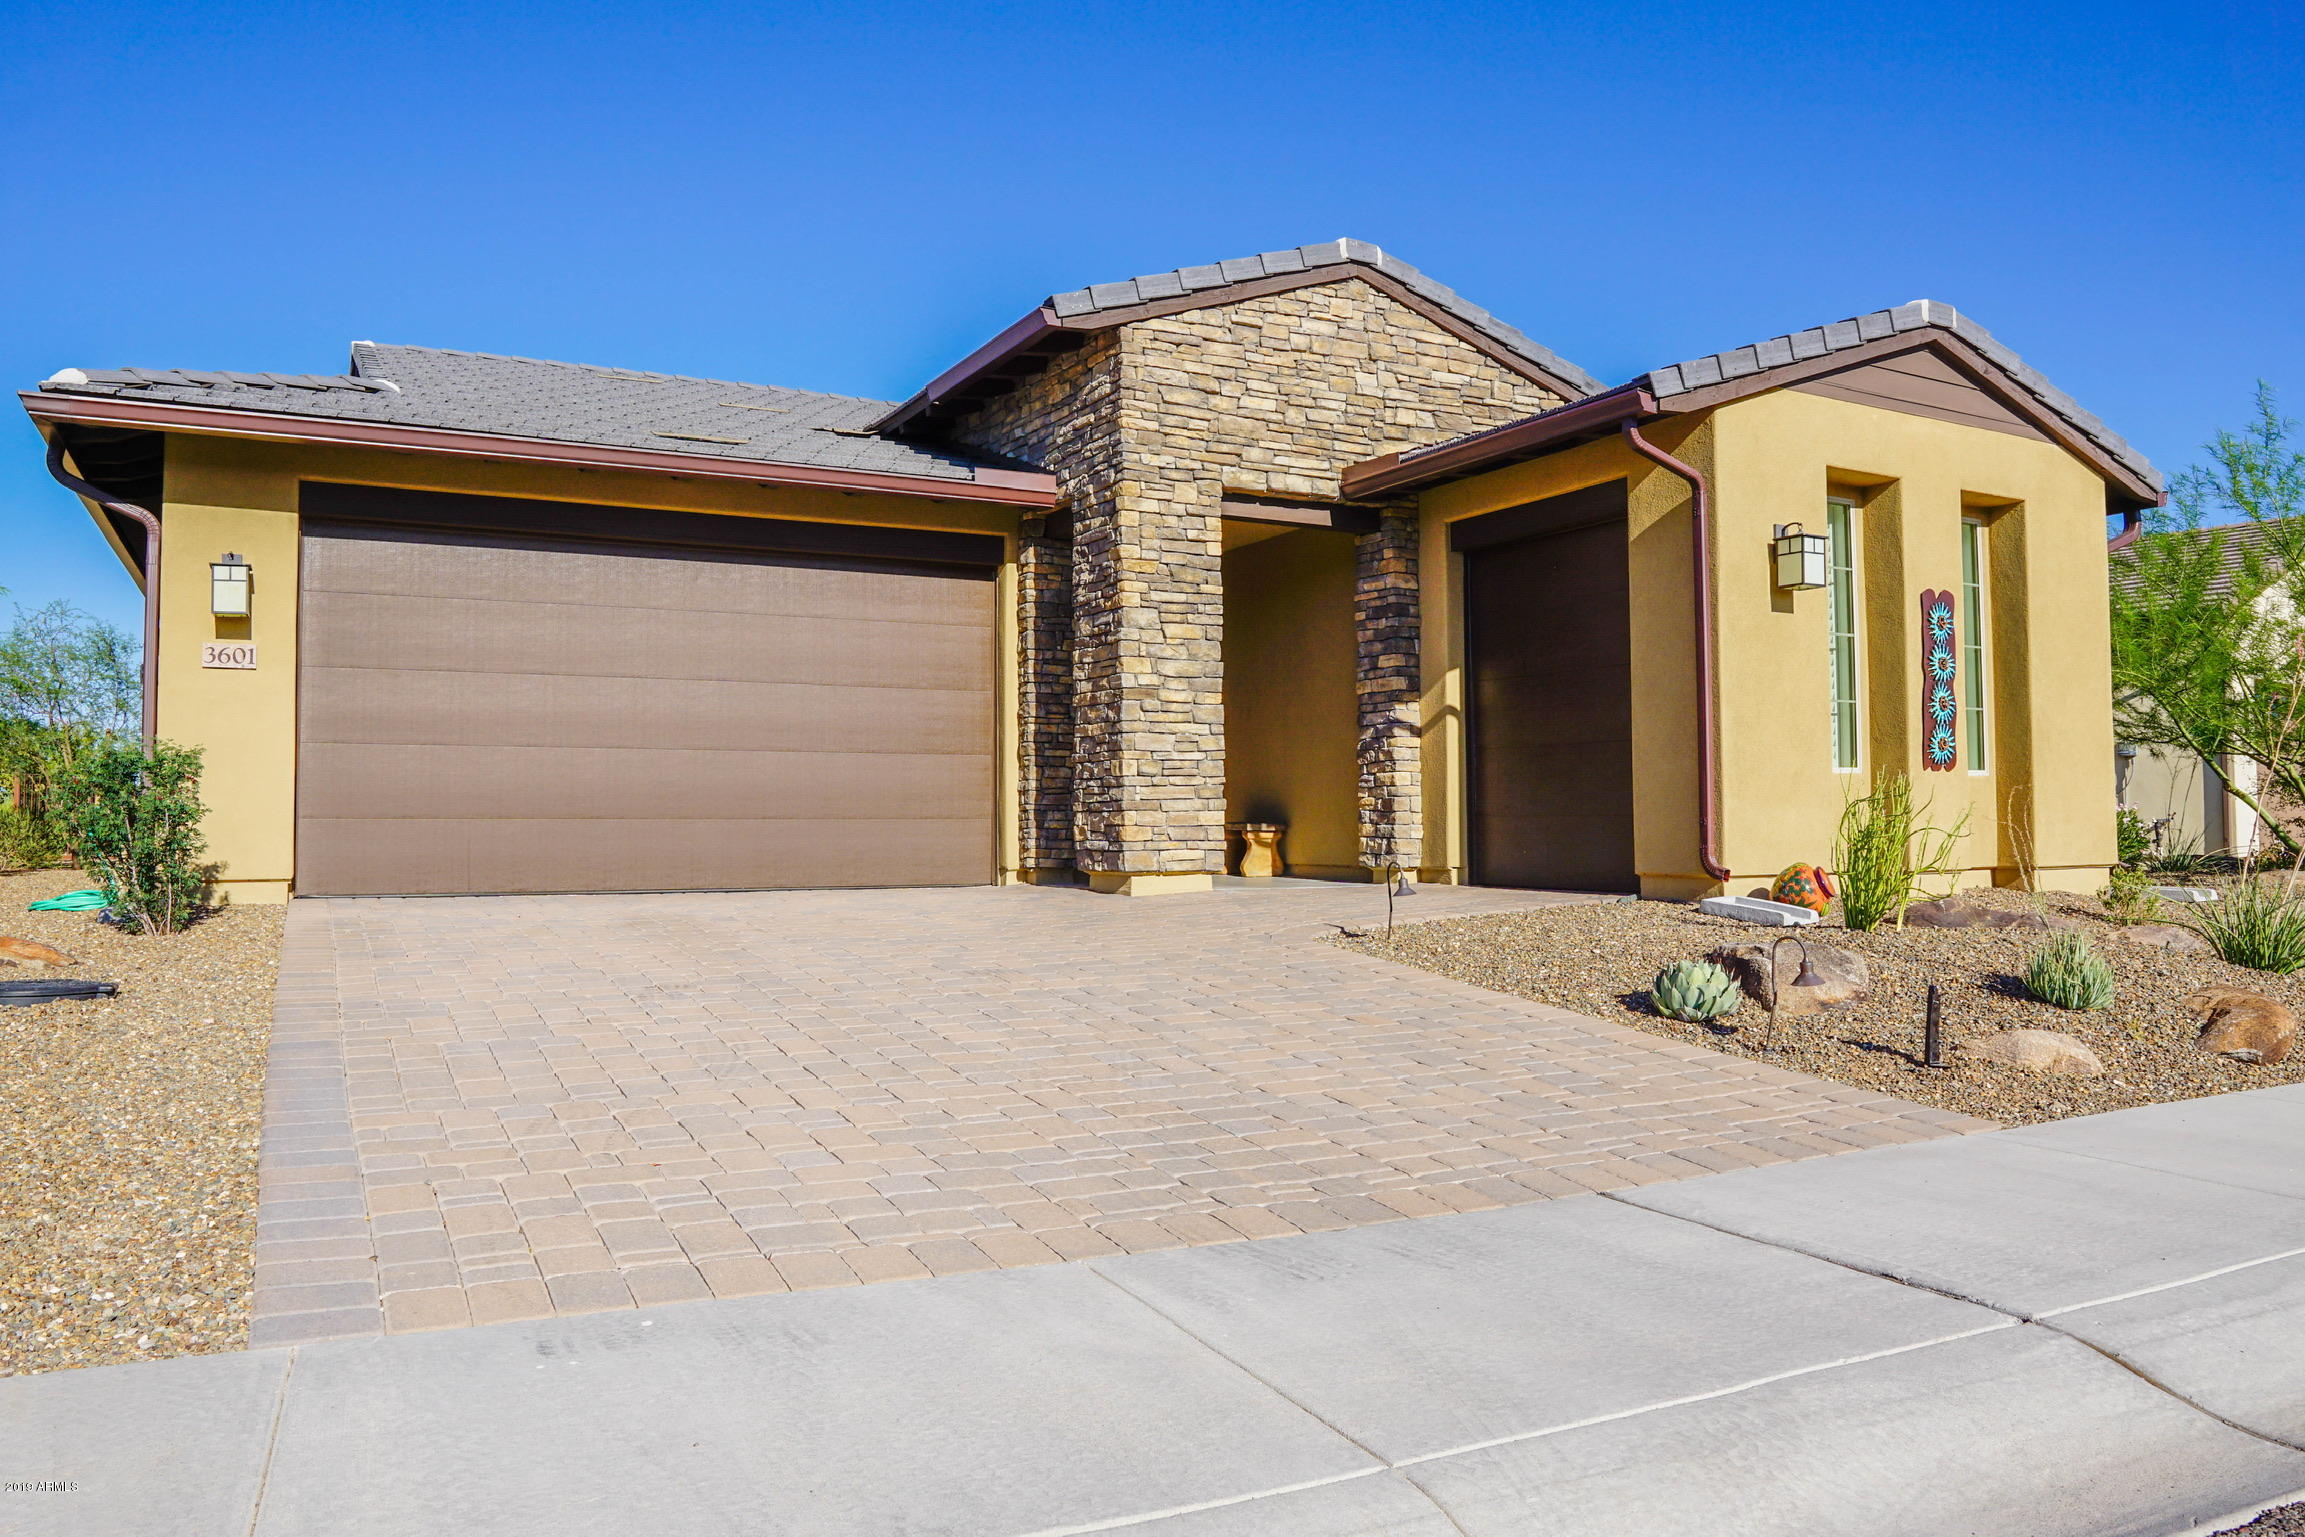 Photo of 3601 STAMPEDE Drive, Wickenburg, AZ 85390